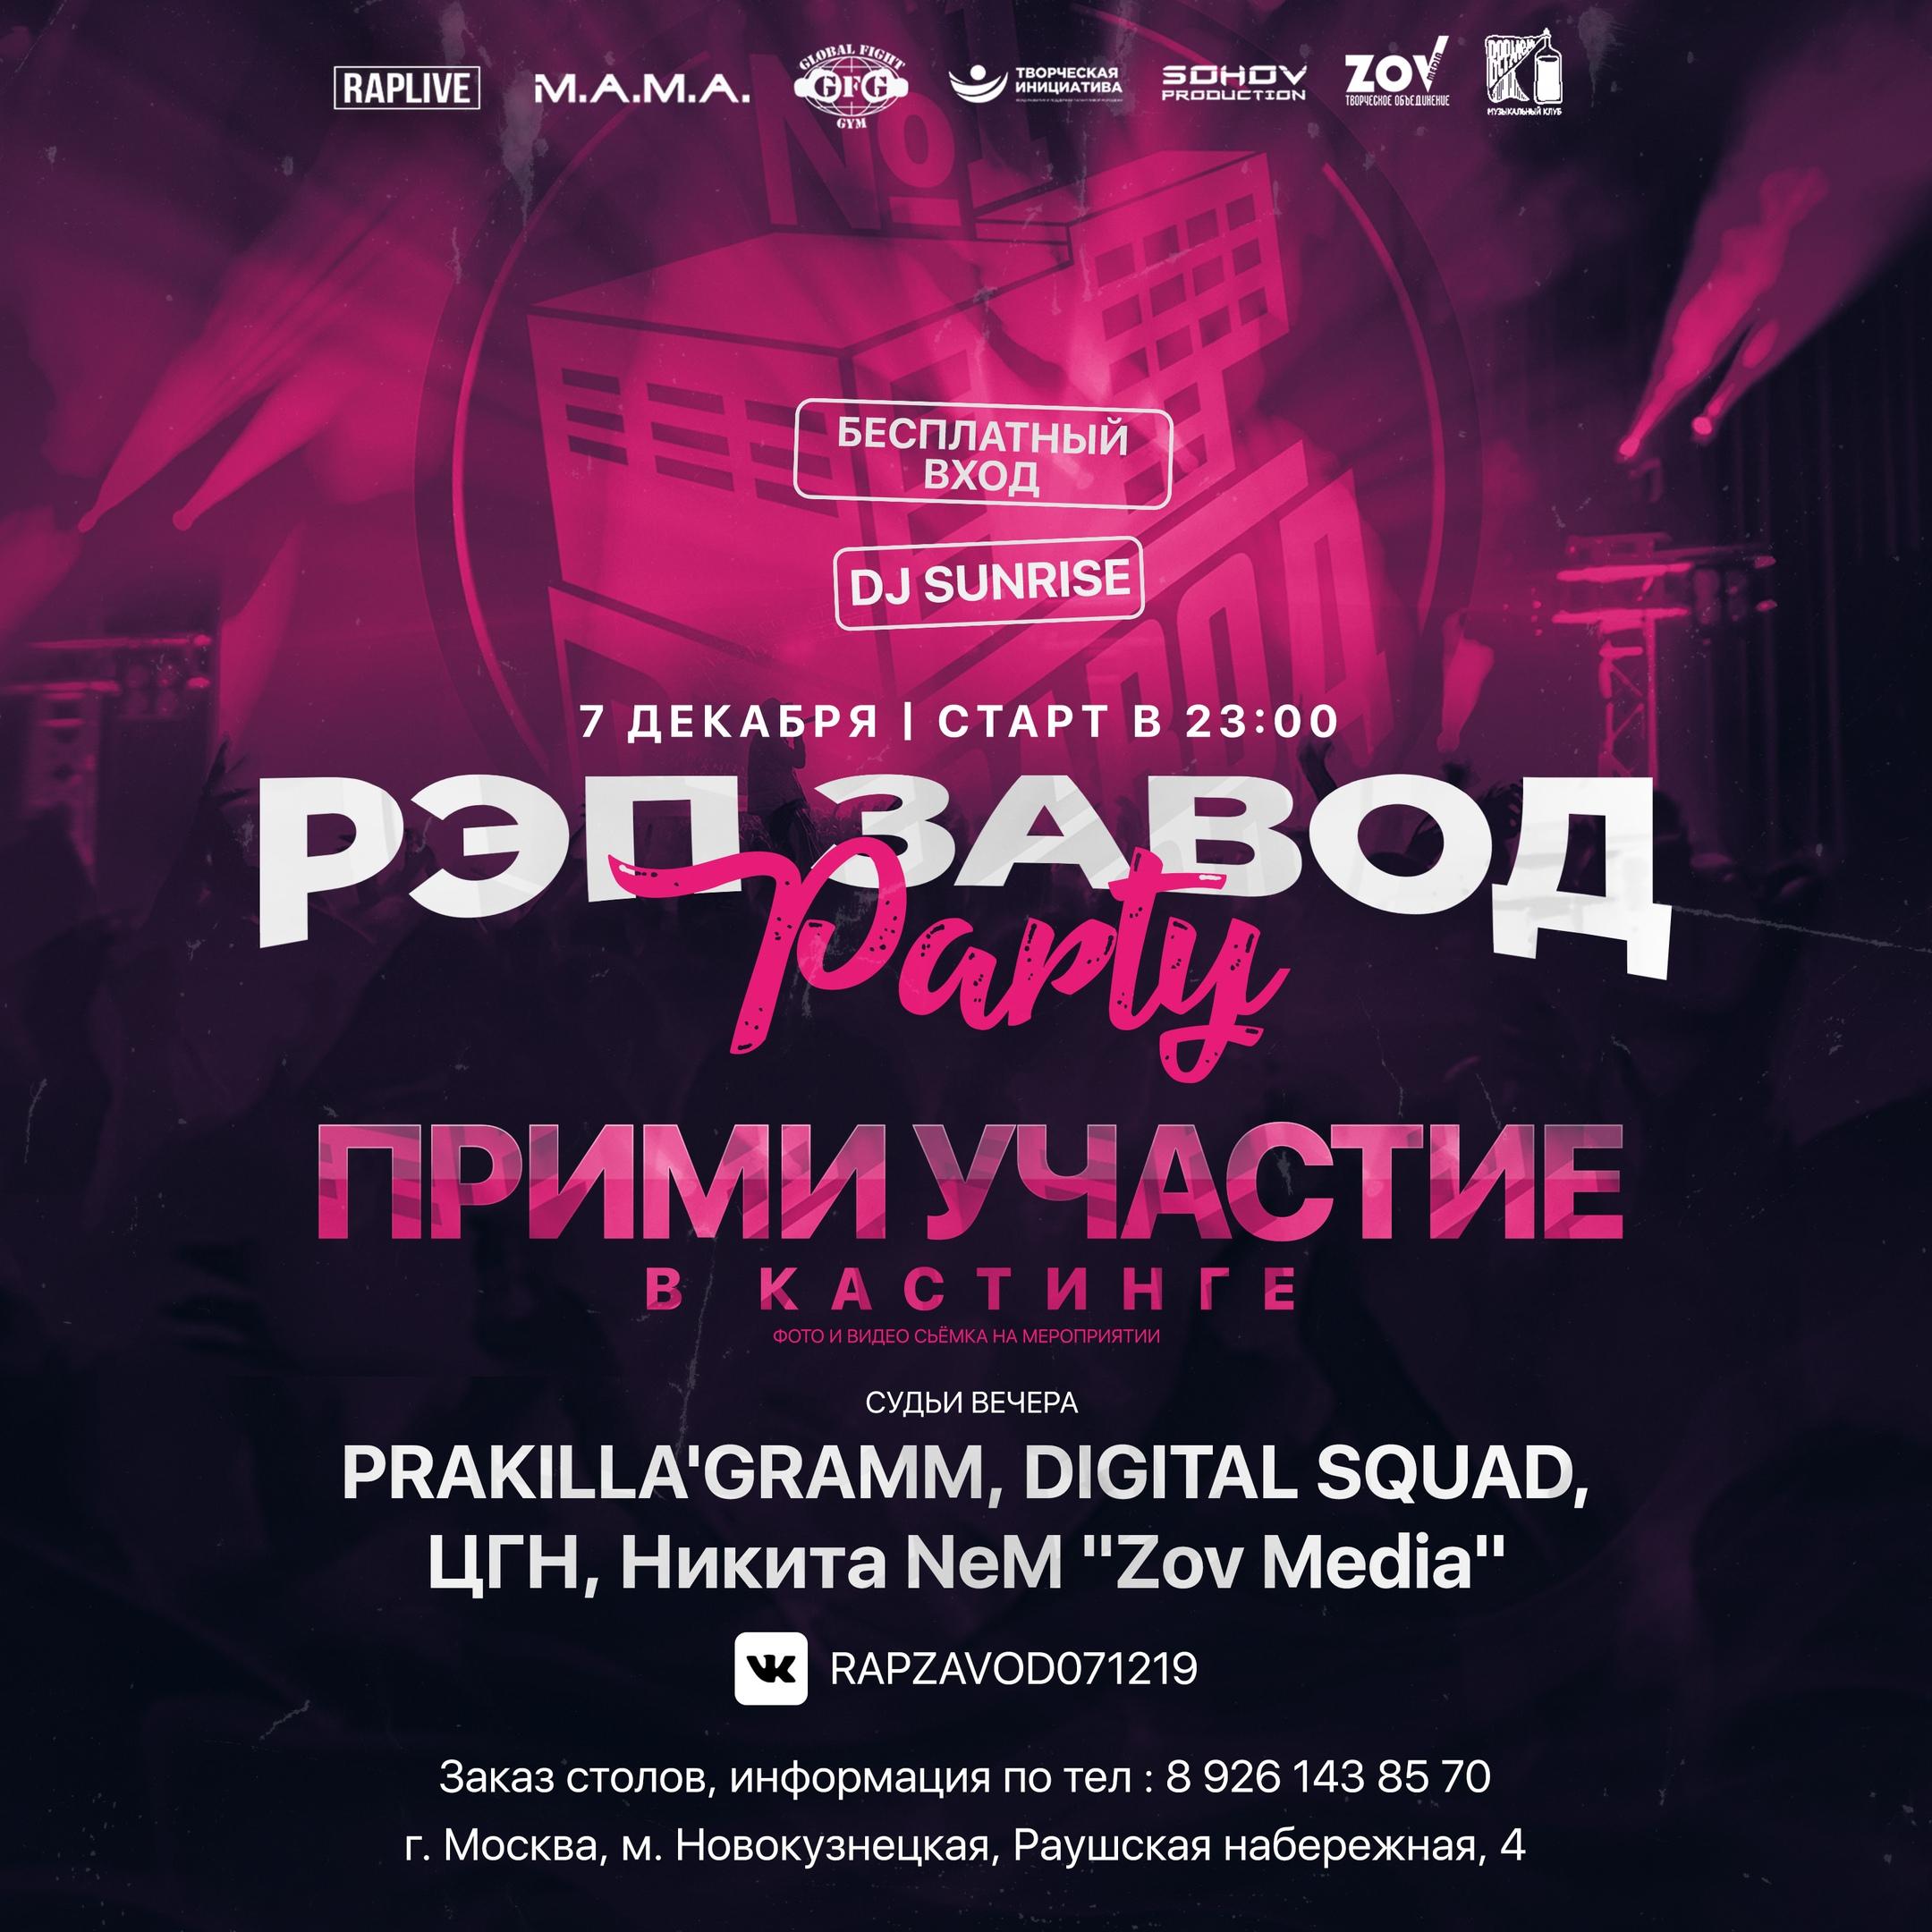 Рэп завод Party